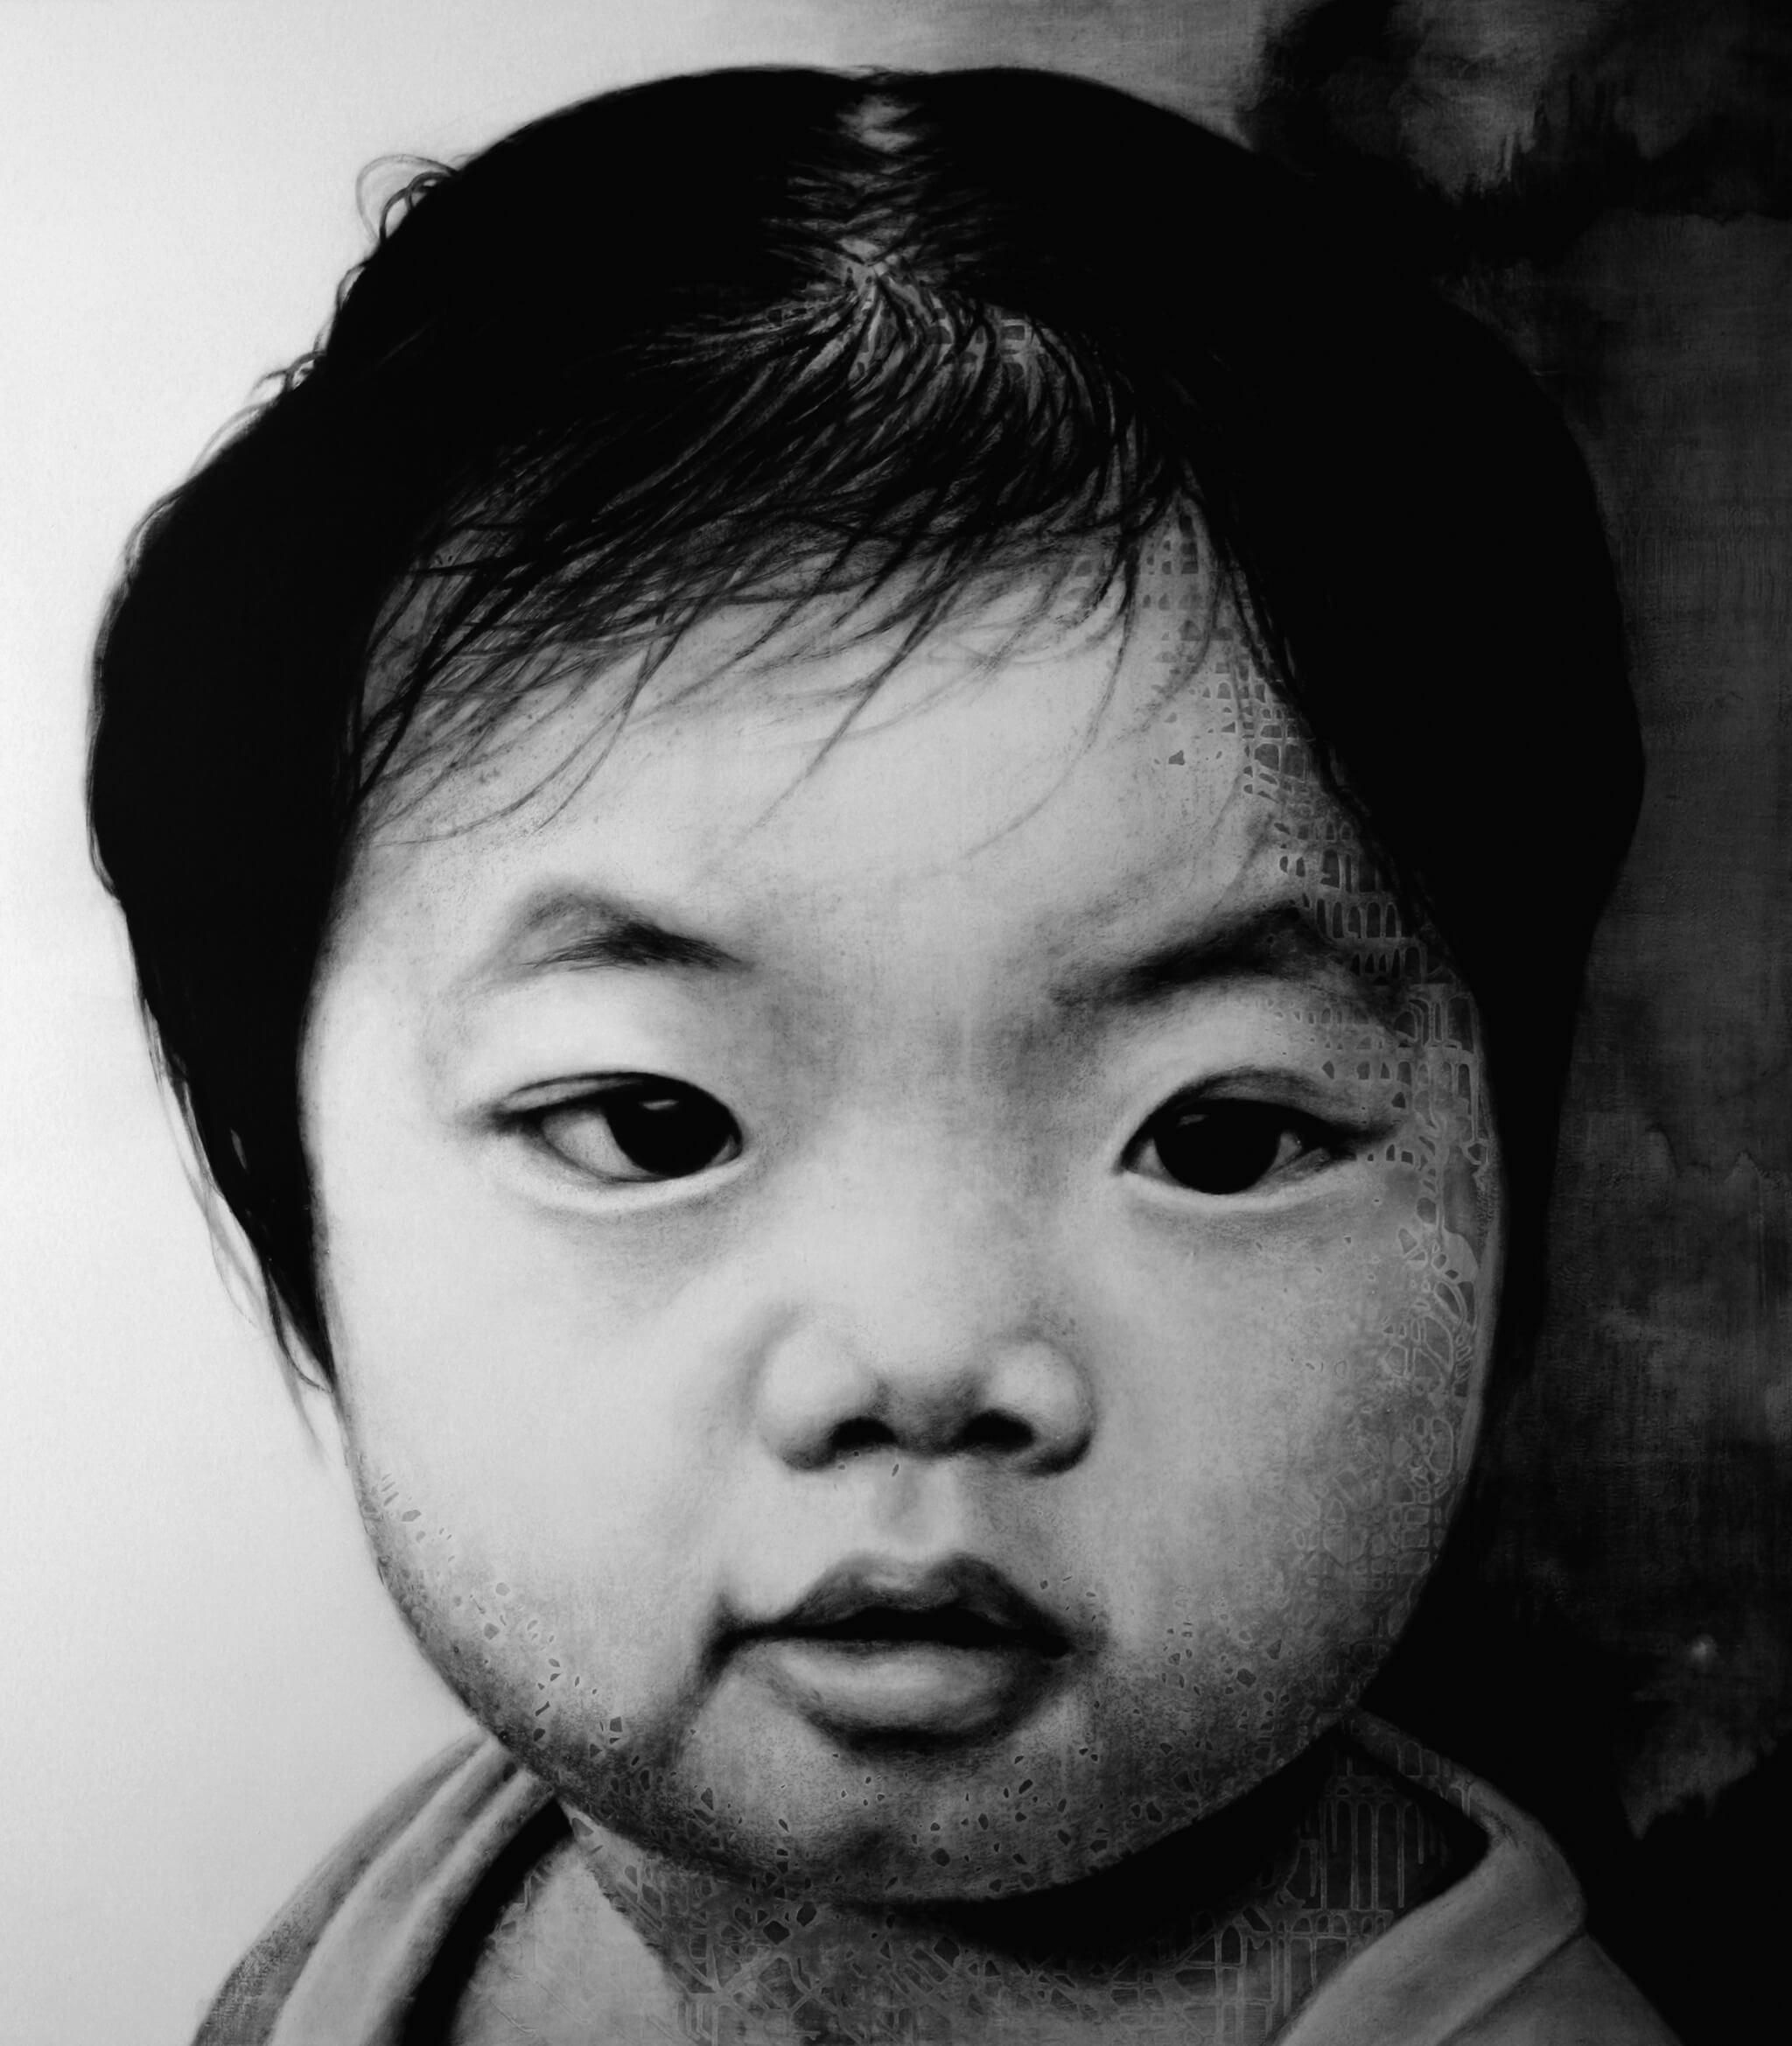 Korean child, 2012